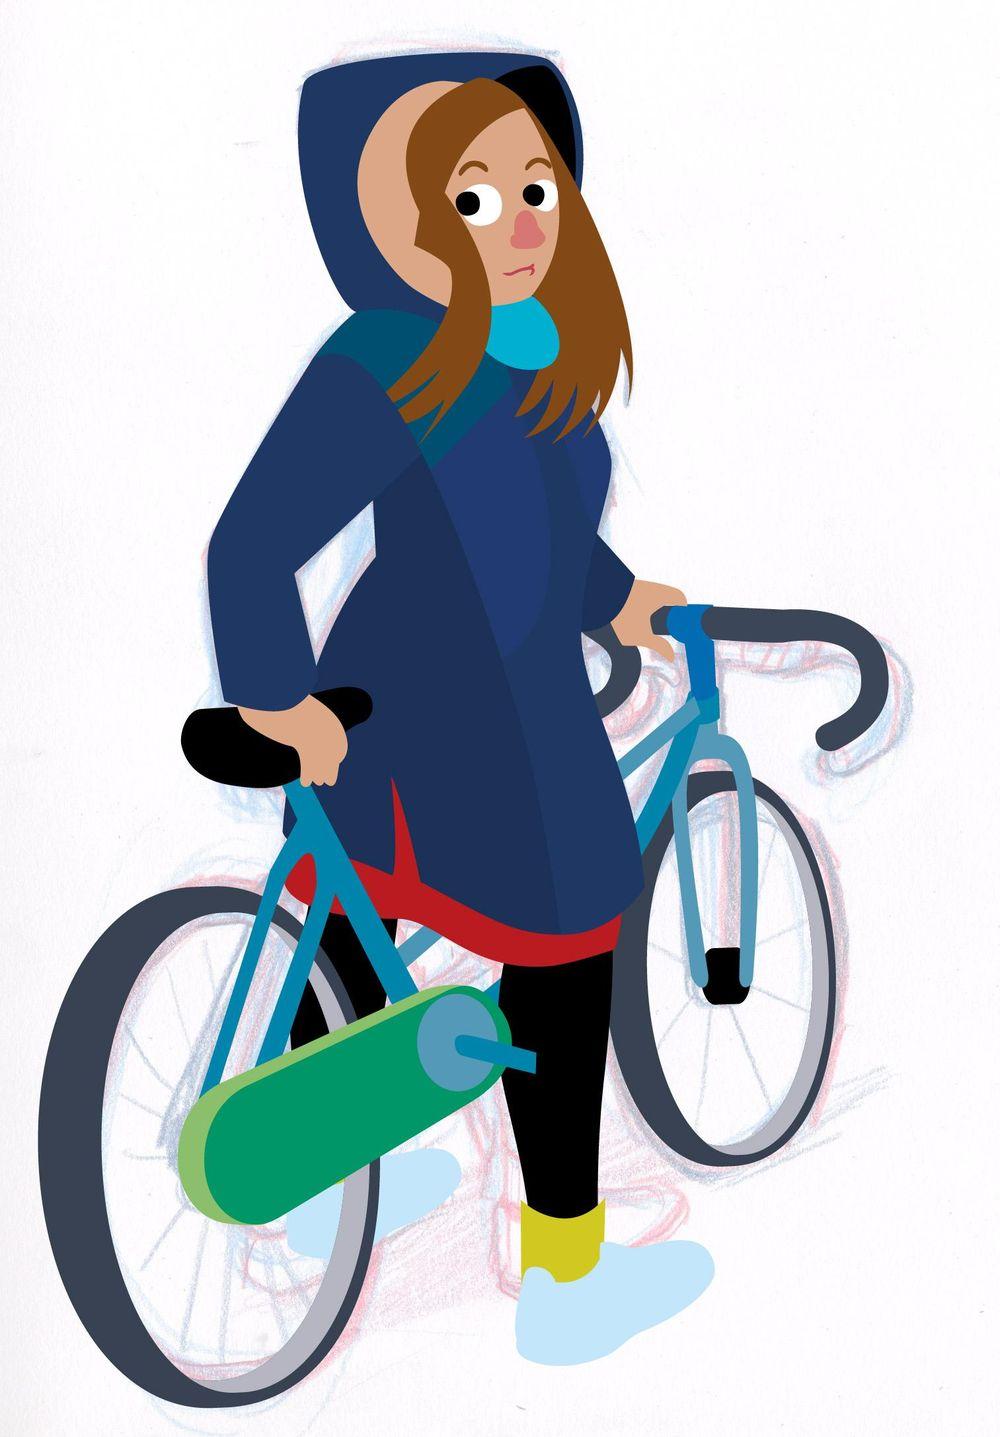 Bike Girl - image 2 - student project